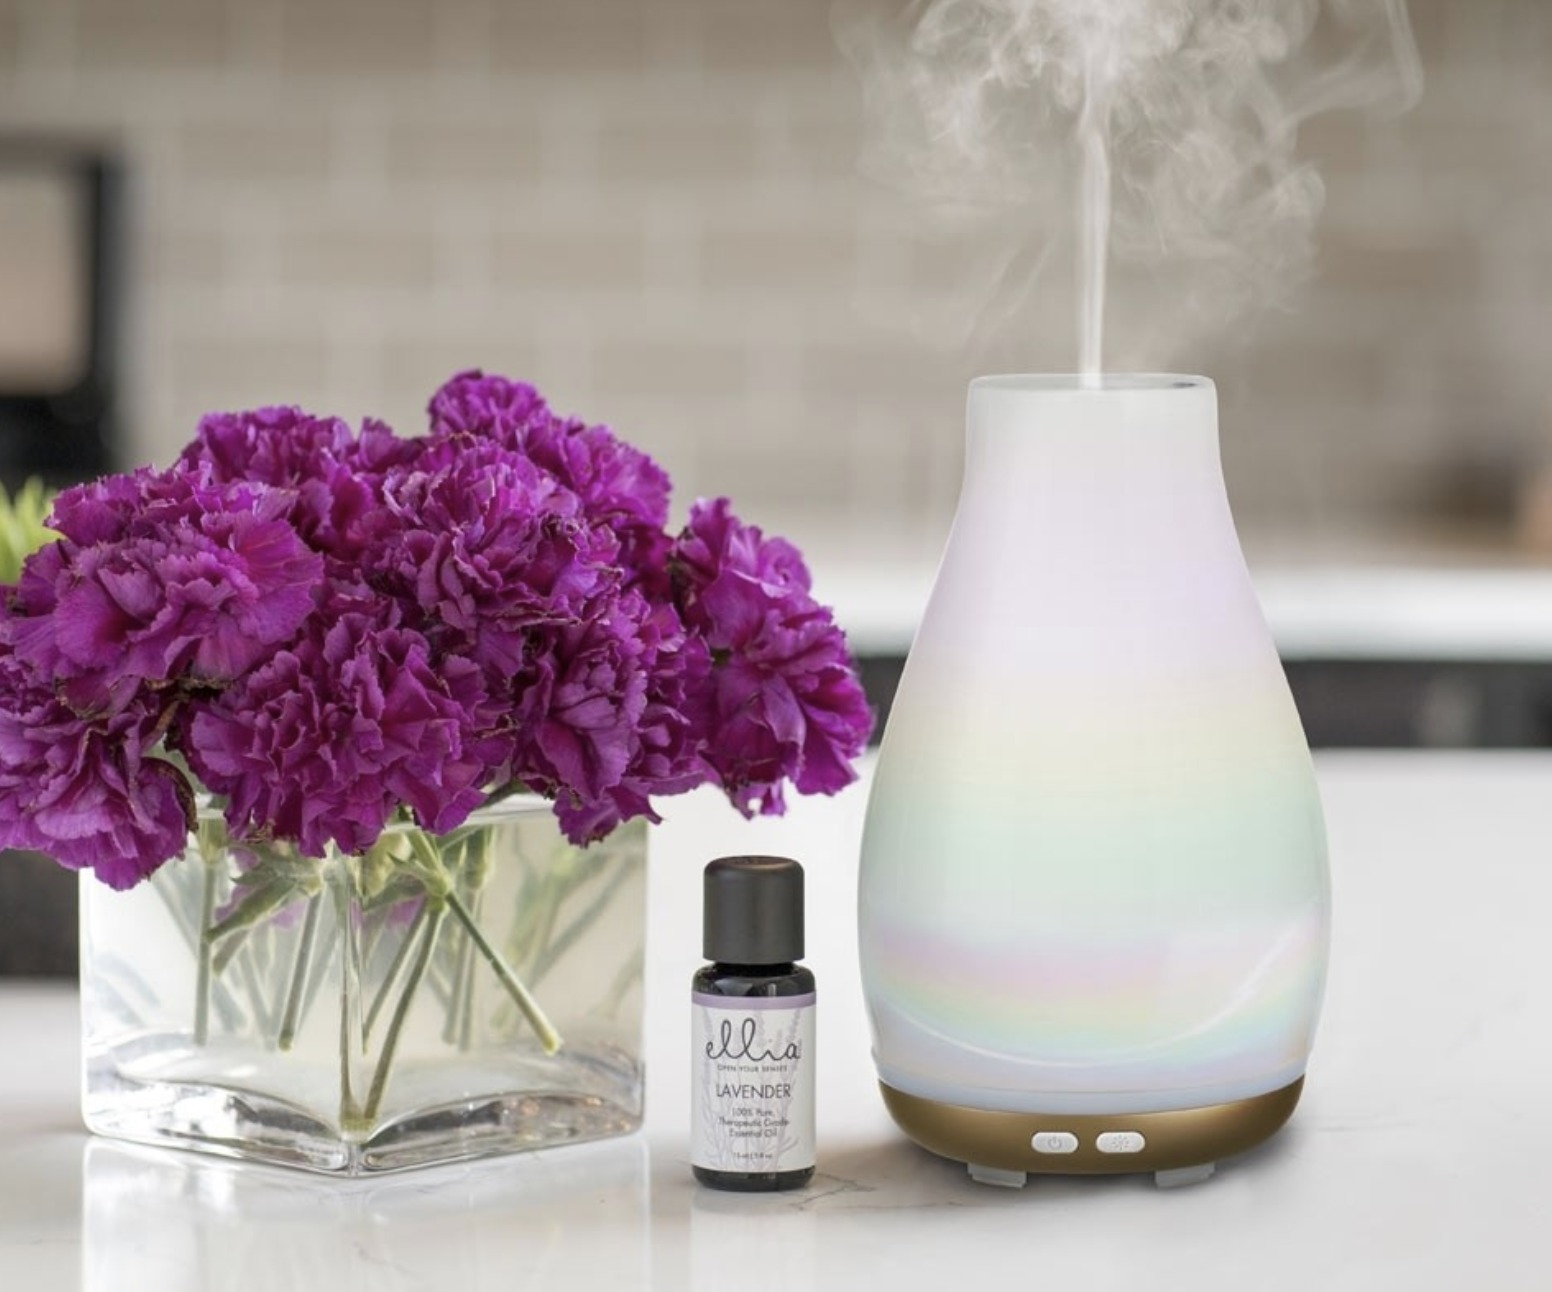 essential oil diffuser by ellia.com